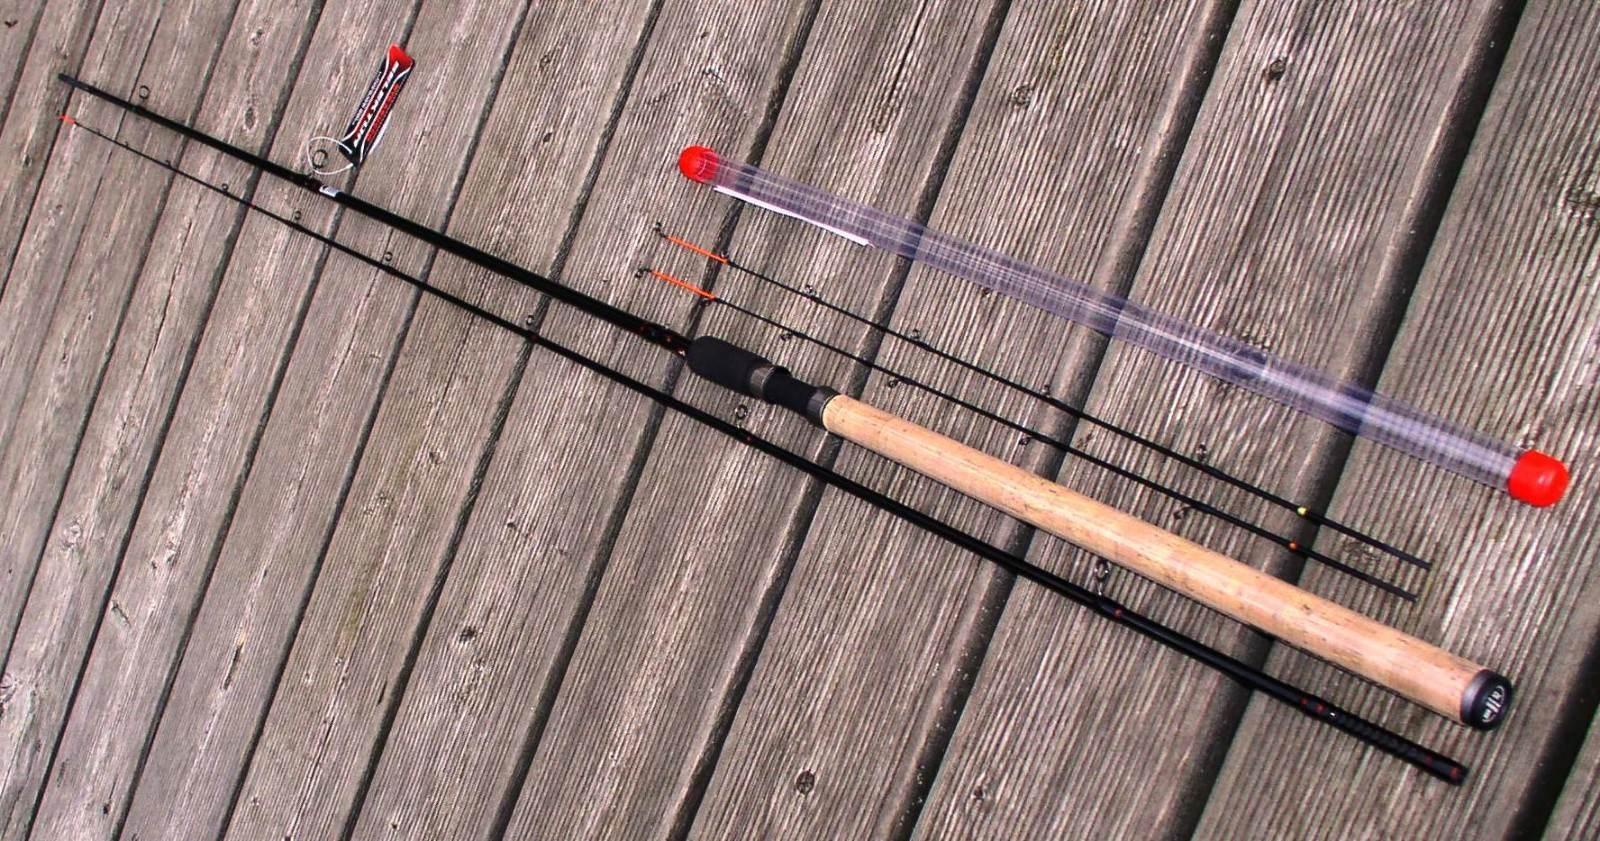 Trabucco Method-Feeder Rute 3,00 oder 3,30 Meter Selektor XS, Feederrute, Feeder